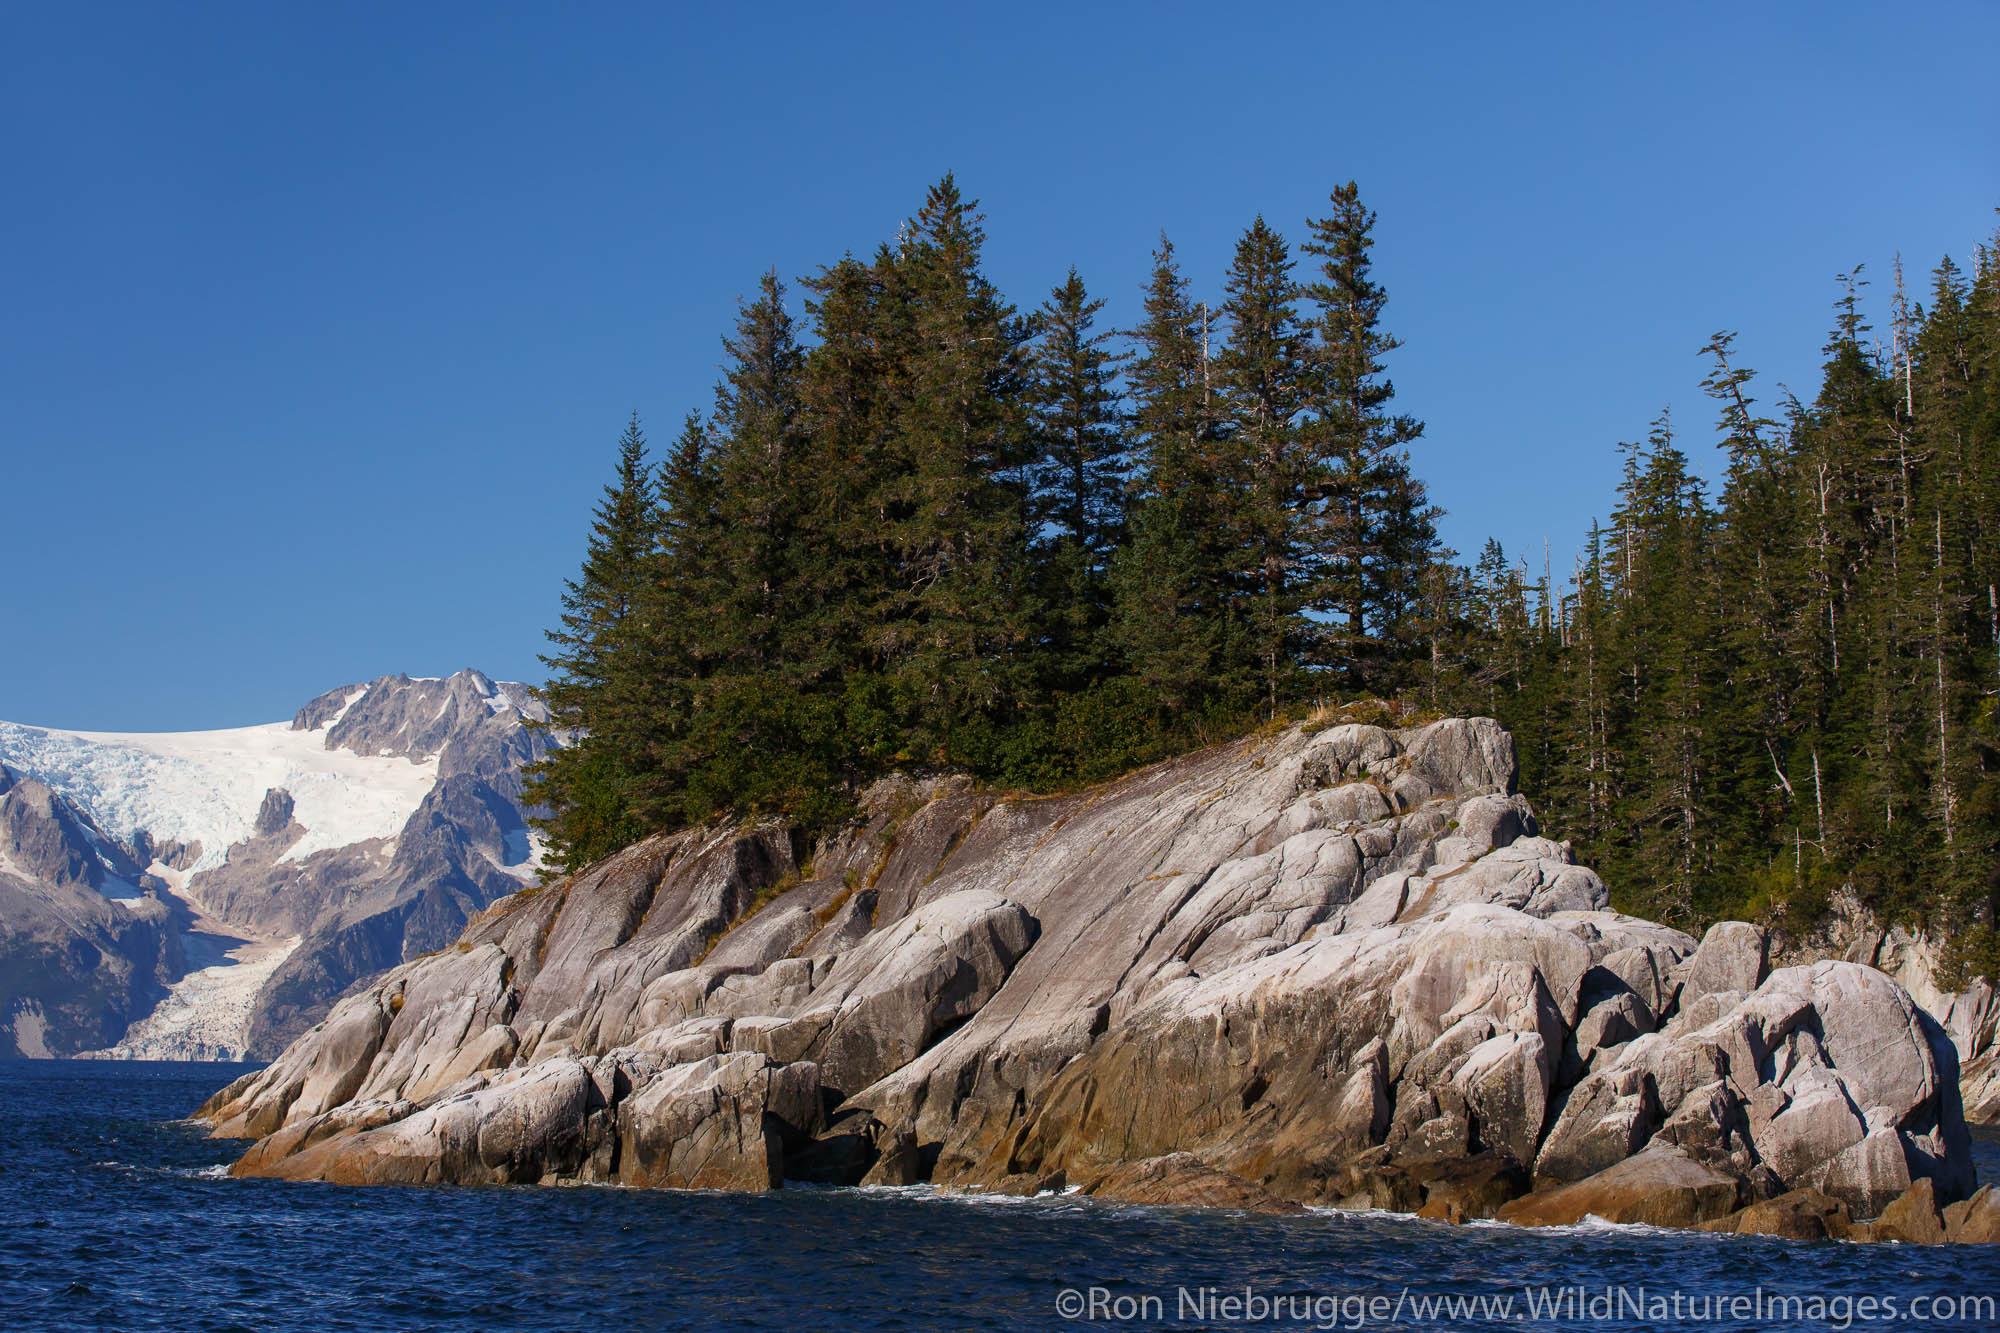 Northwestern Fjord, Kenai Fjords National Park, near Seward, Alaska.